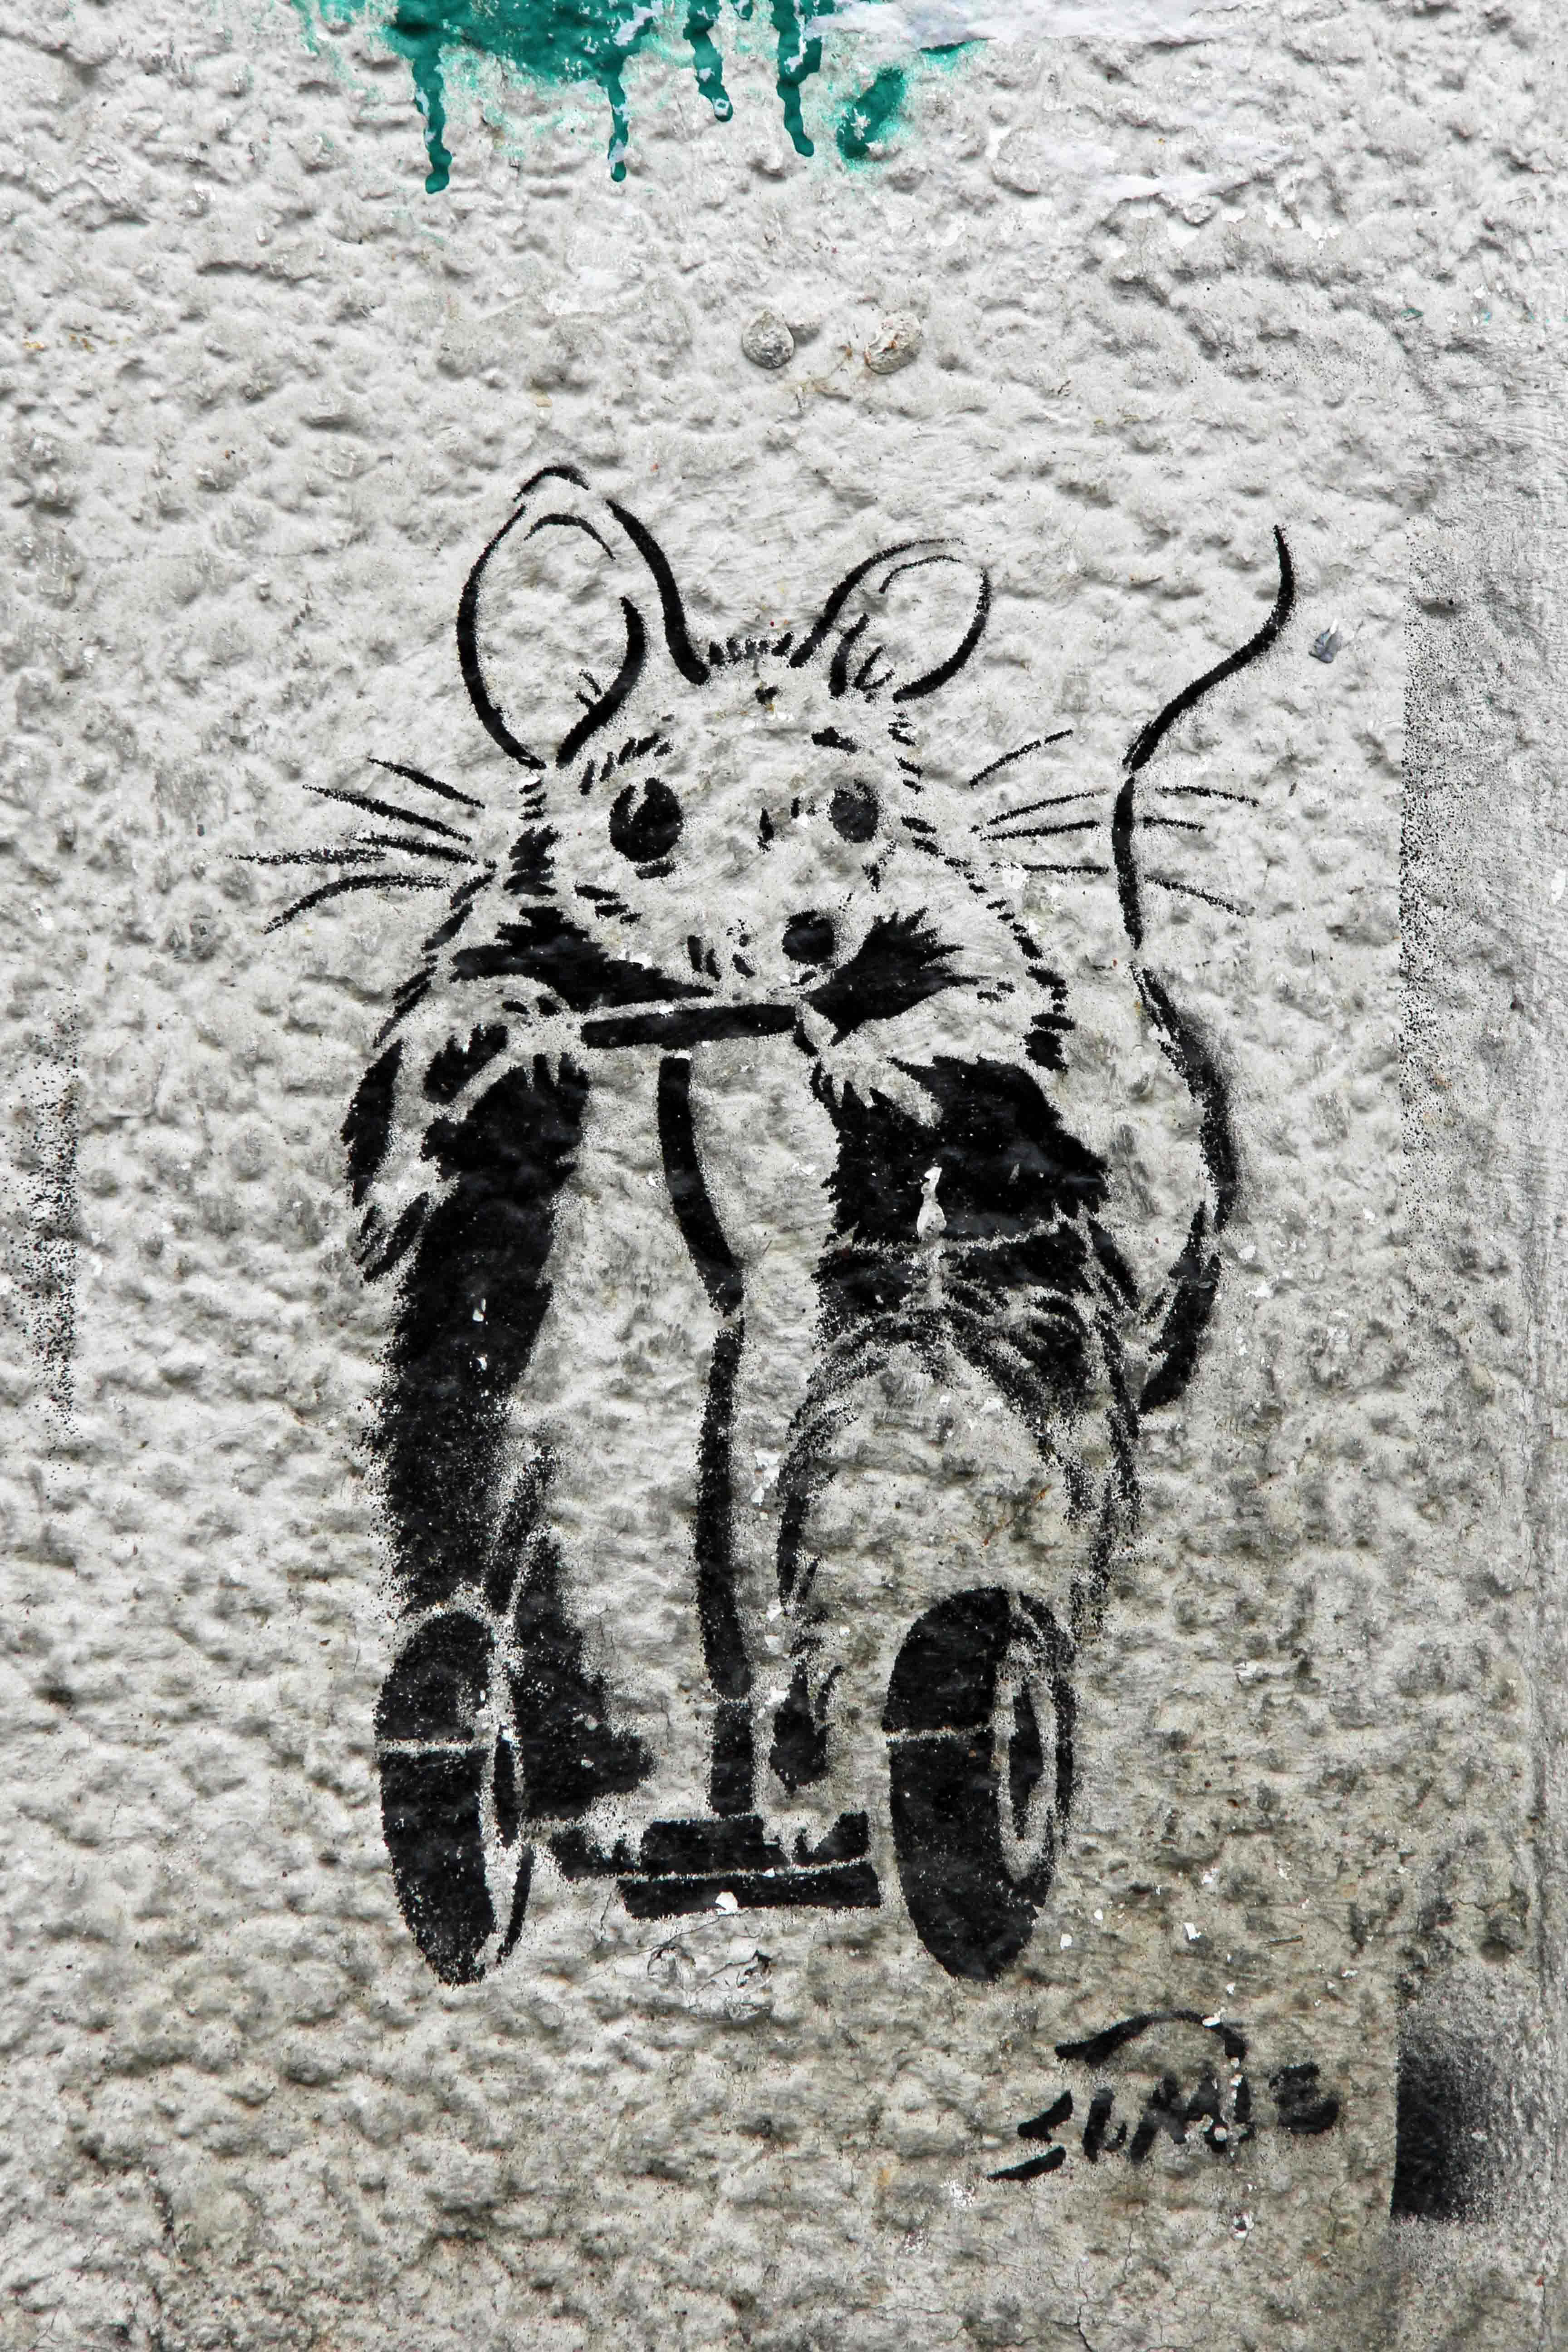 Mouse on Segway - Street Art by Unknown Artist in Berlin